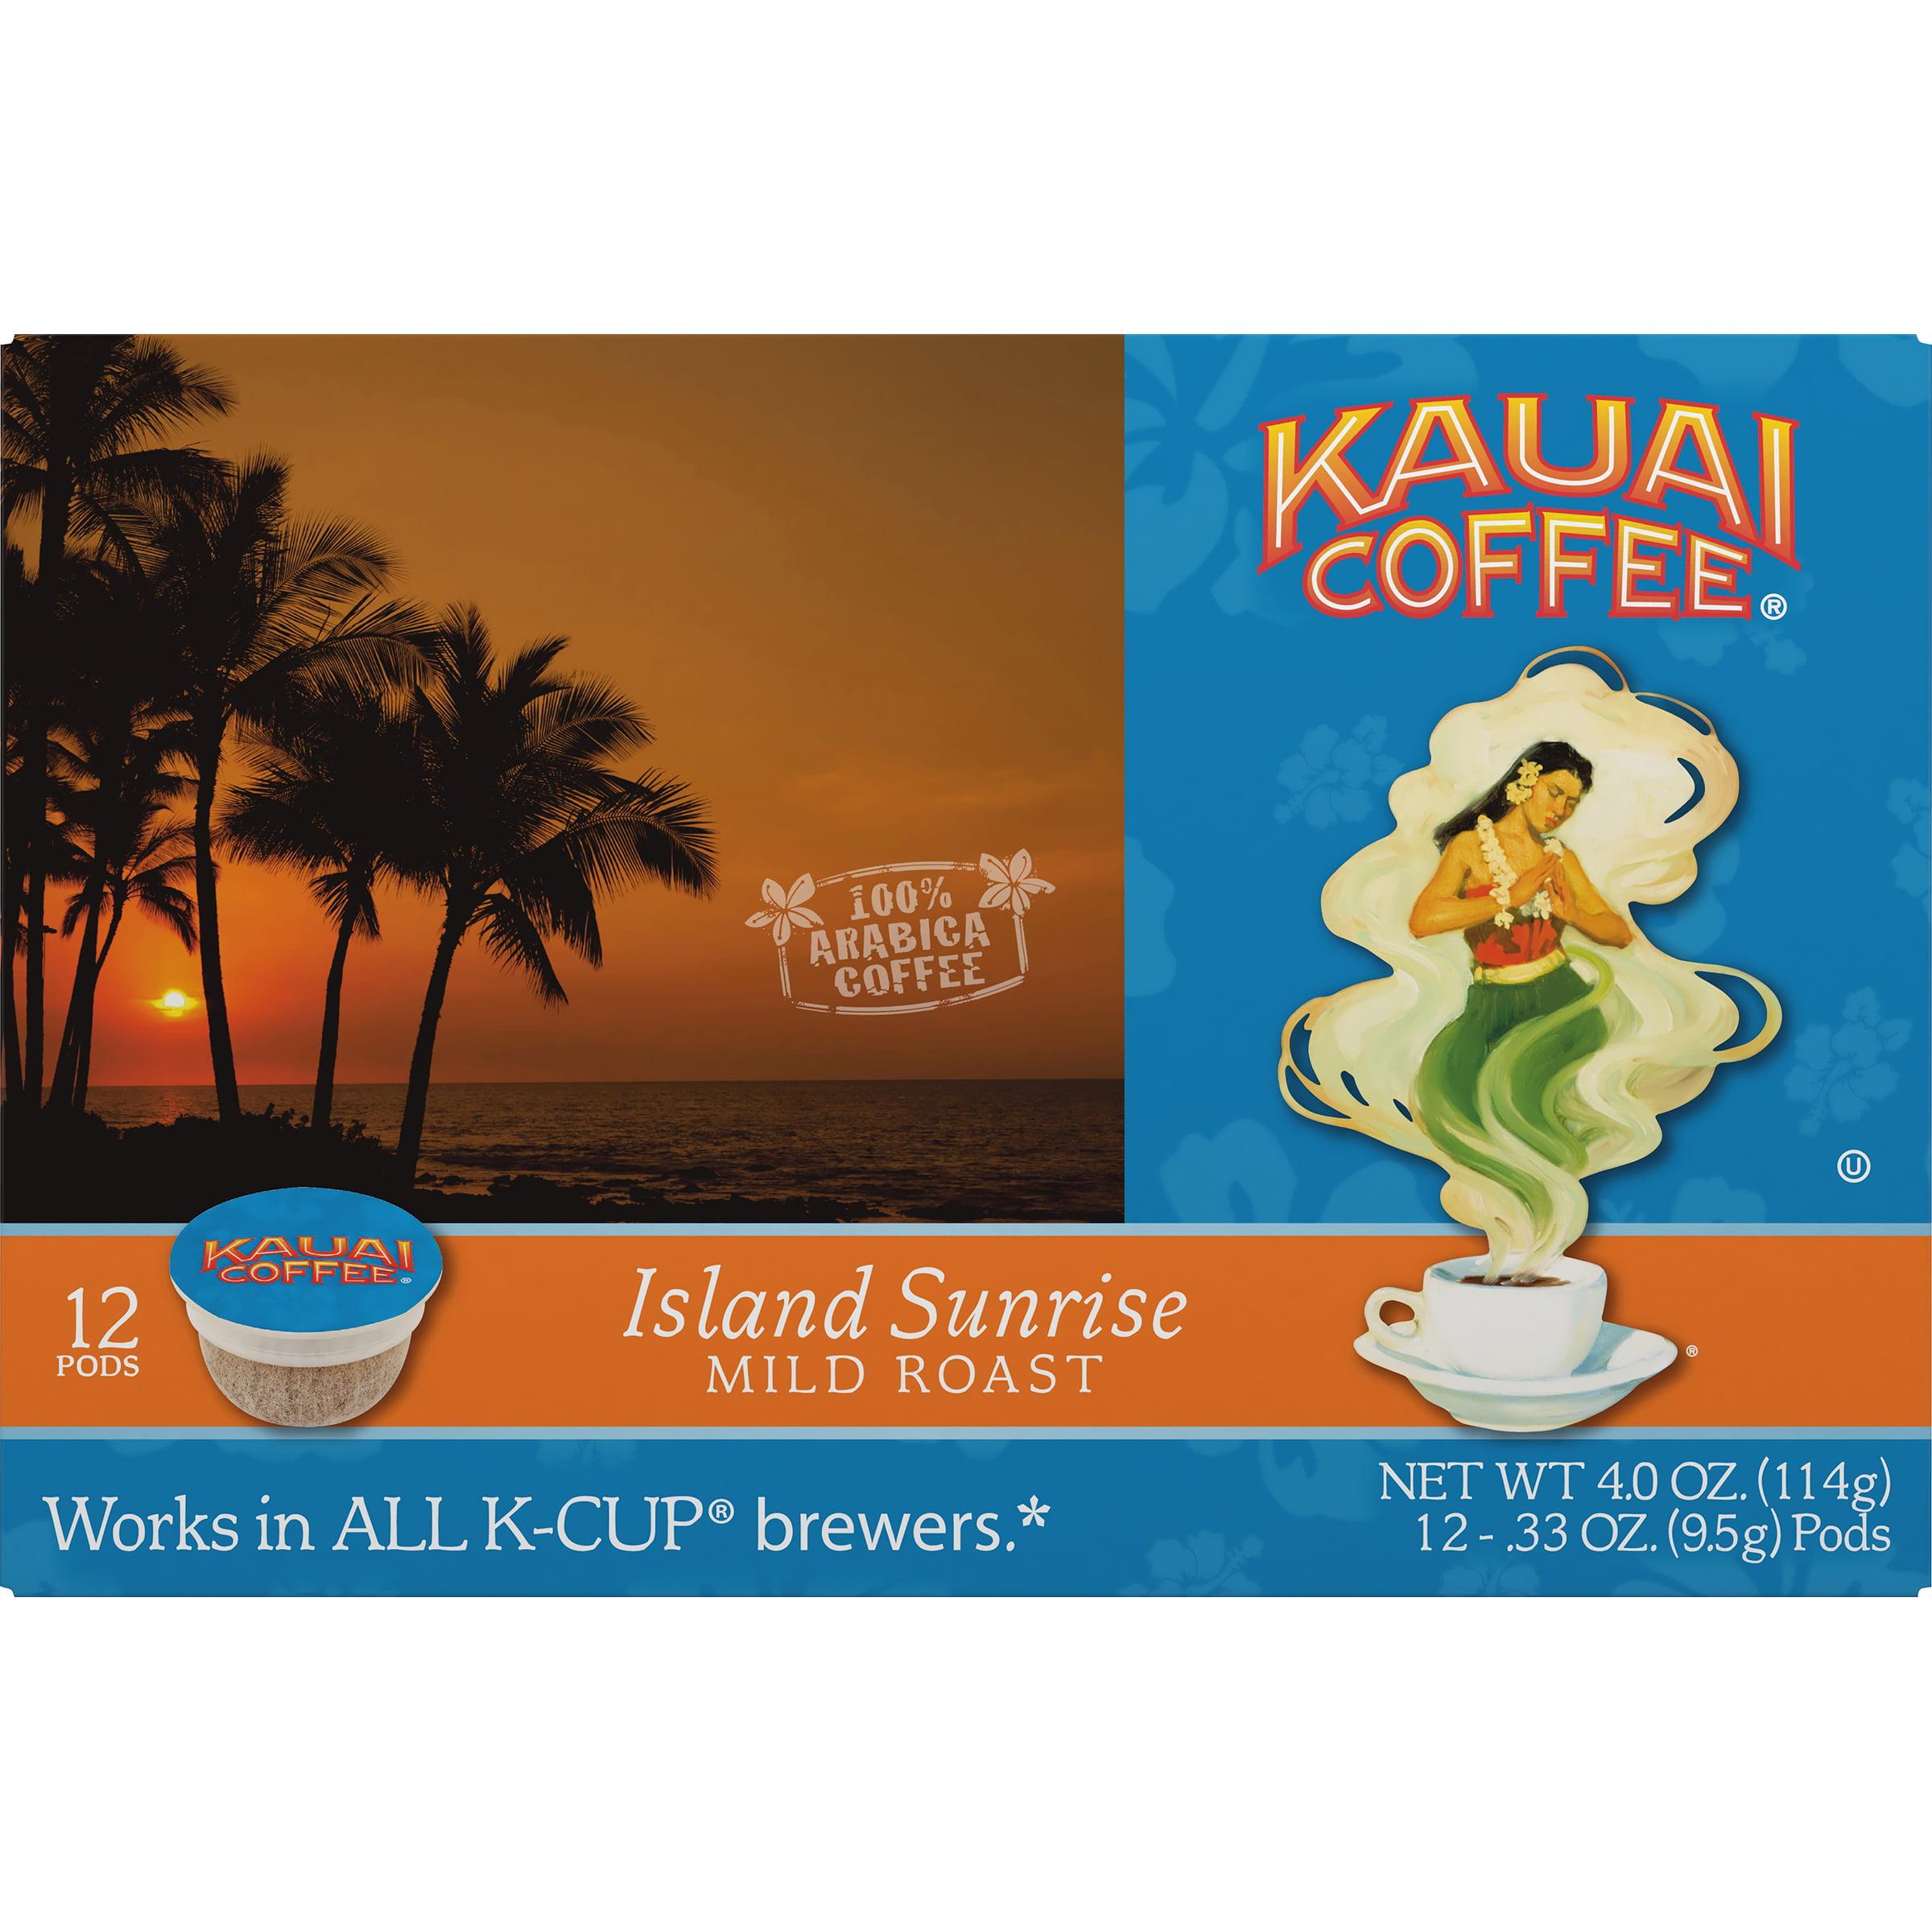 Kauai Coffee Island Sunrise Hawaiian K-Cup Coffee Pods, Mild Roast, 12 Count